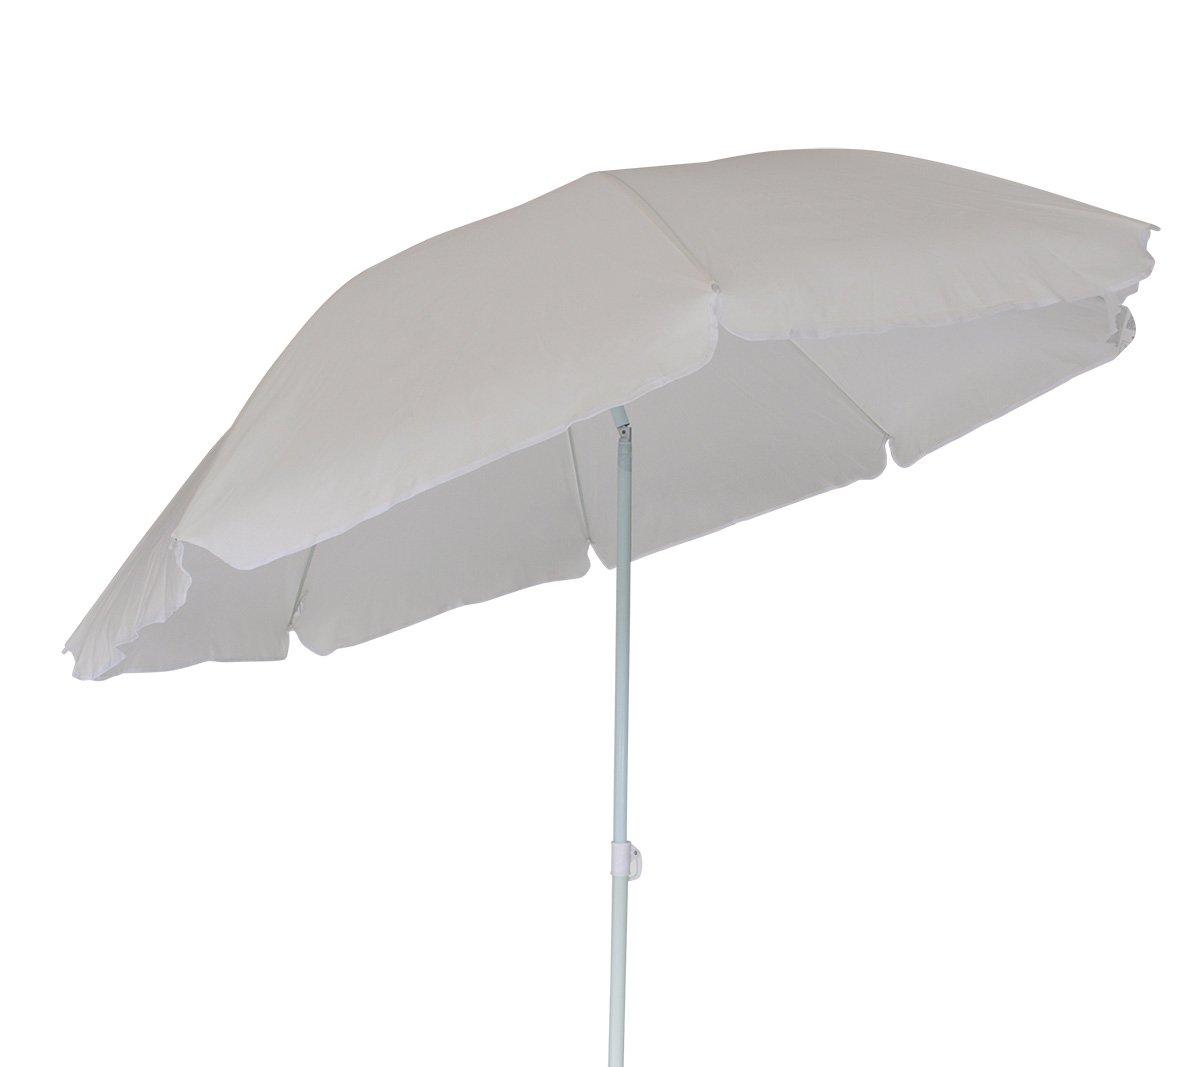 Strandschirm Sonnenschirm 200cm naturfarben, knickbar jetzt bestellen